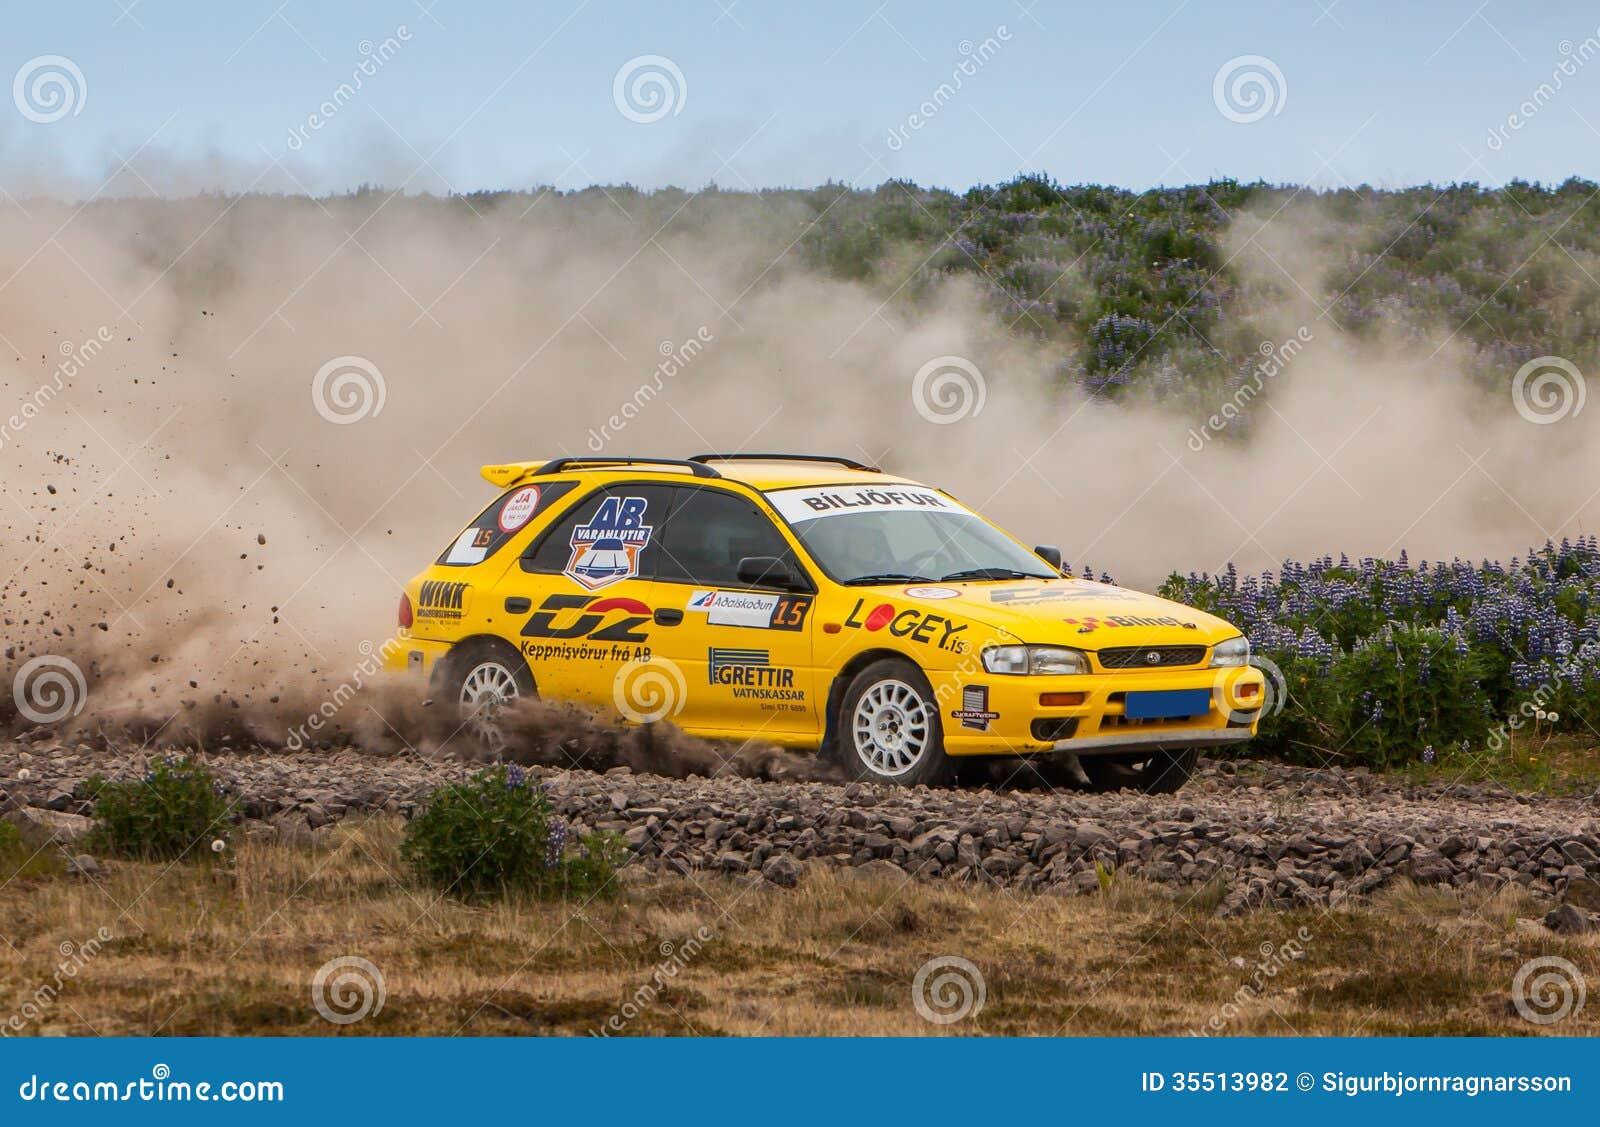 Alsko subaru impreza rallycar editorial photography. image of